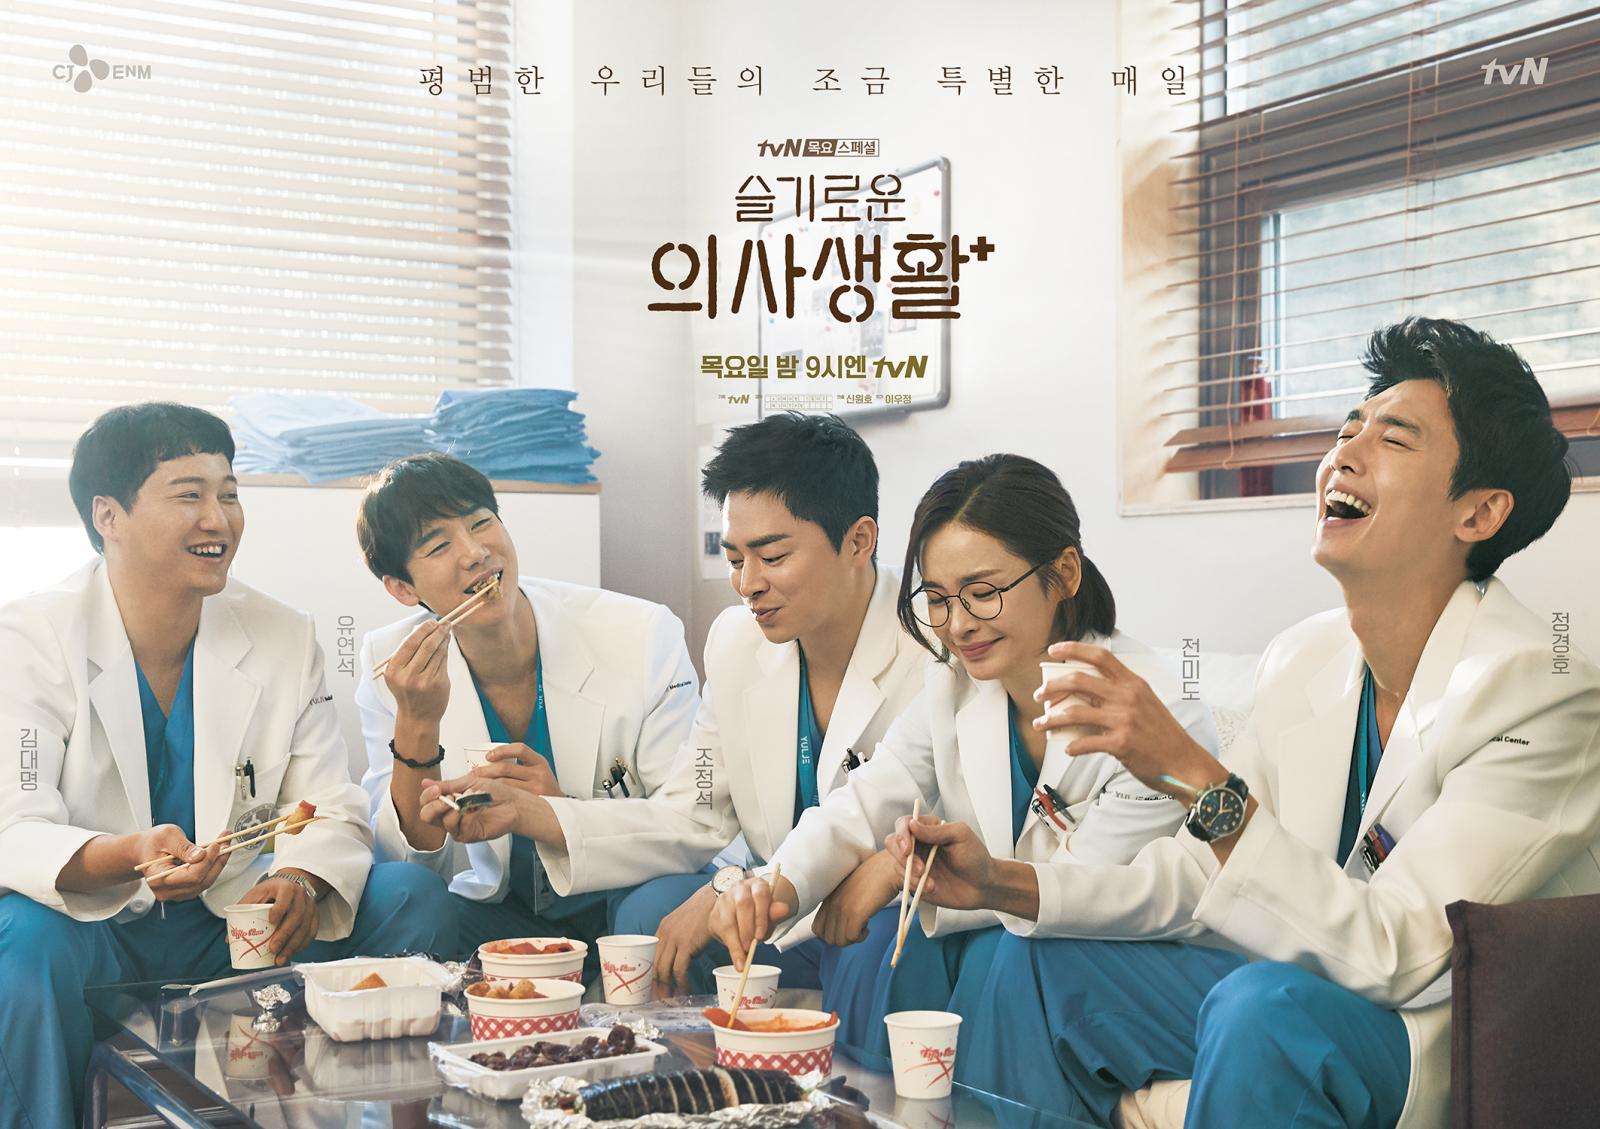 Sutradara Hospital Playlist Semakin Yakin Untuk Menggarap Drama